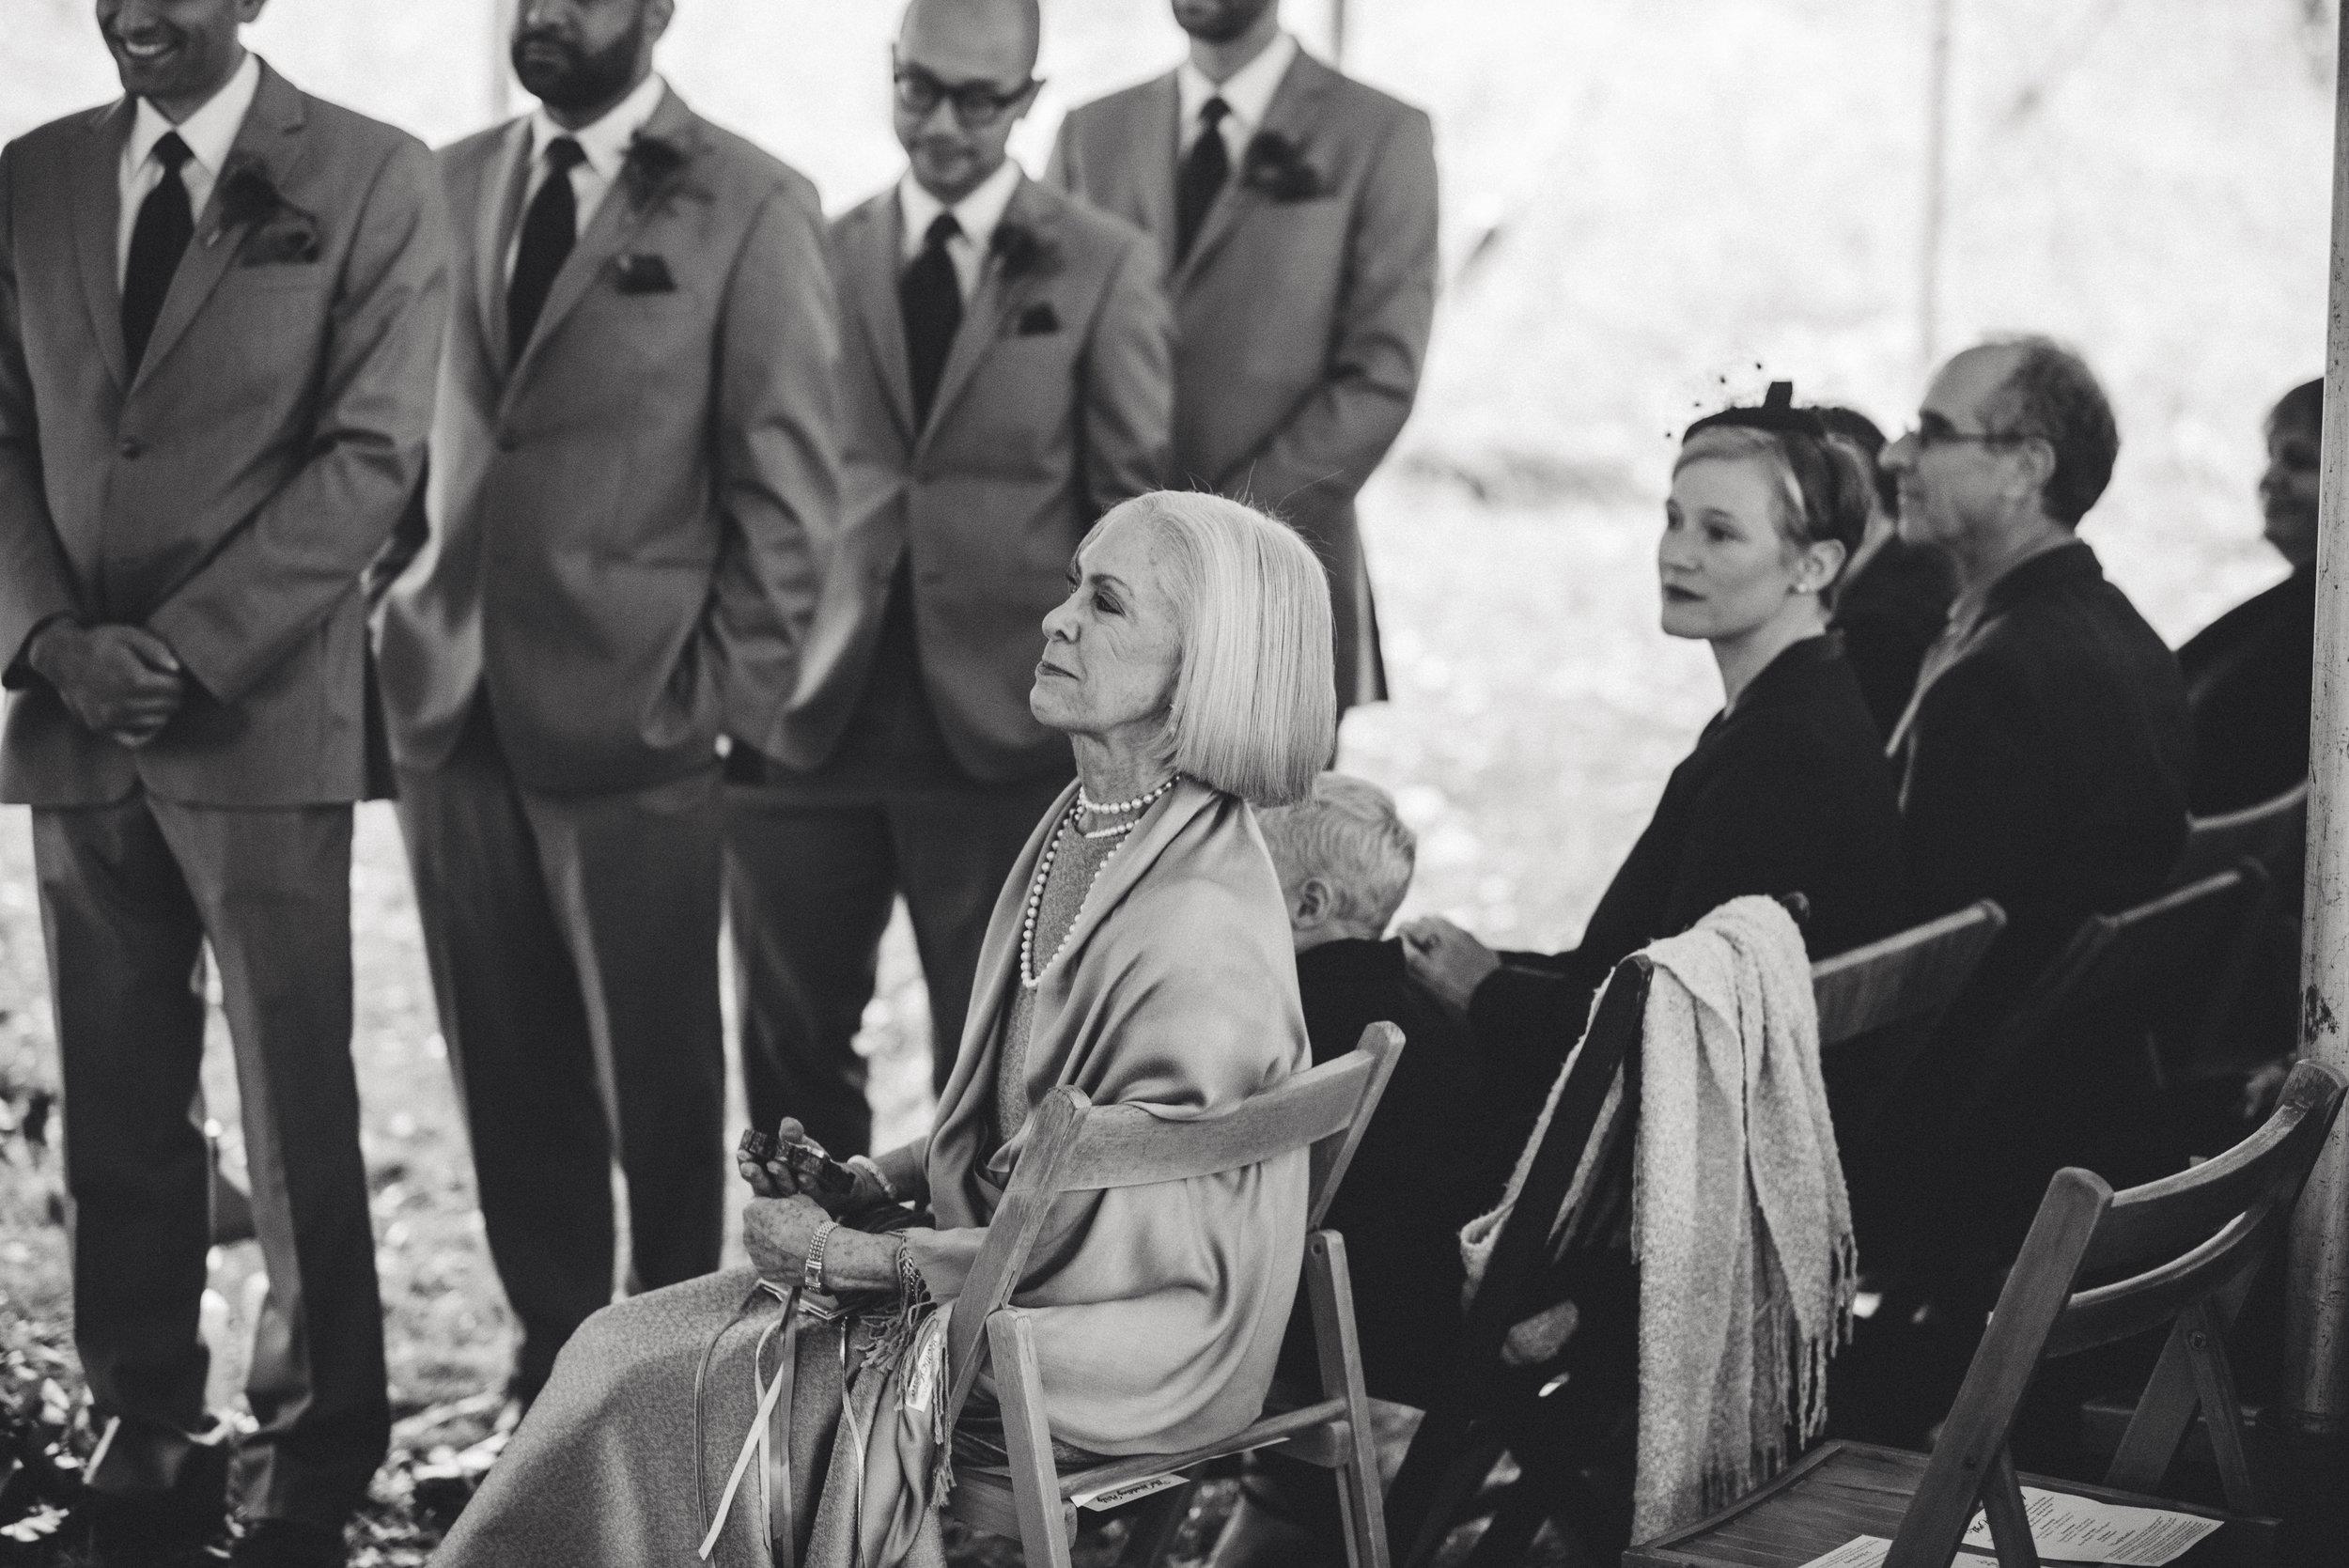 JACQUELINE & ANDREW WARSHAWER -BROOKMILL FARM FALL WEDDING - INTIMATE WEDDING PHOTOGRAPHER - TWOTWENTY by CHI-CHI AGBIM-237.jpg